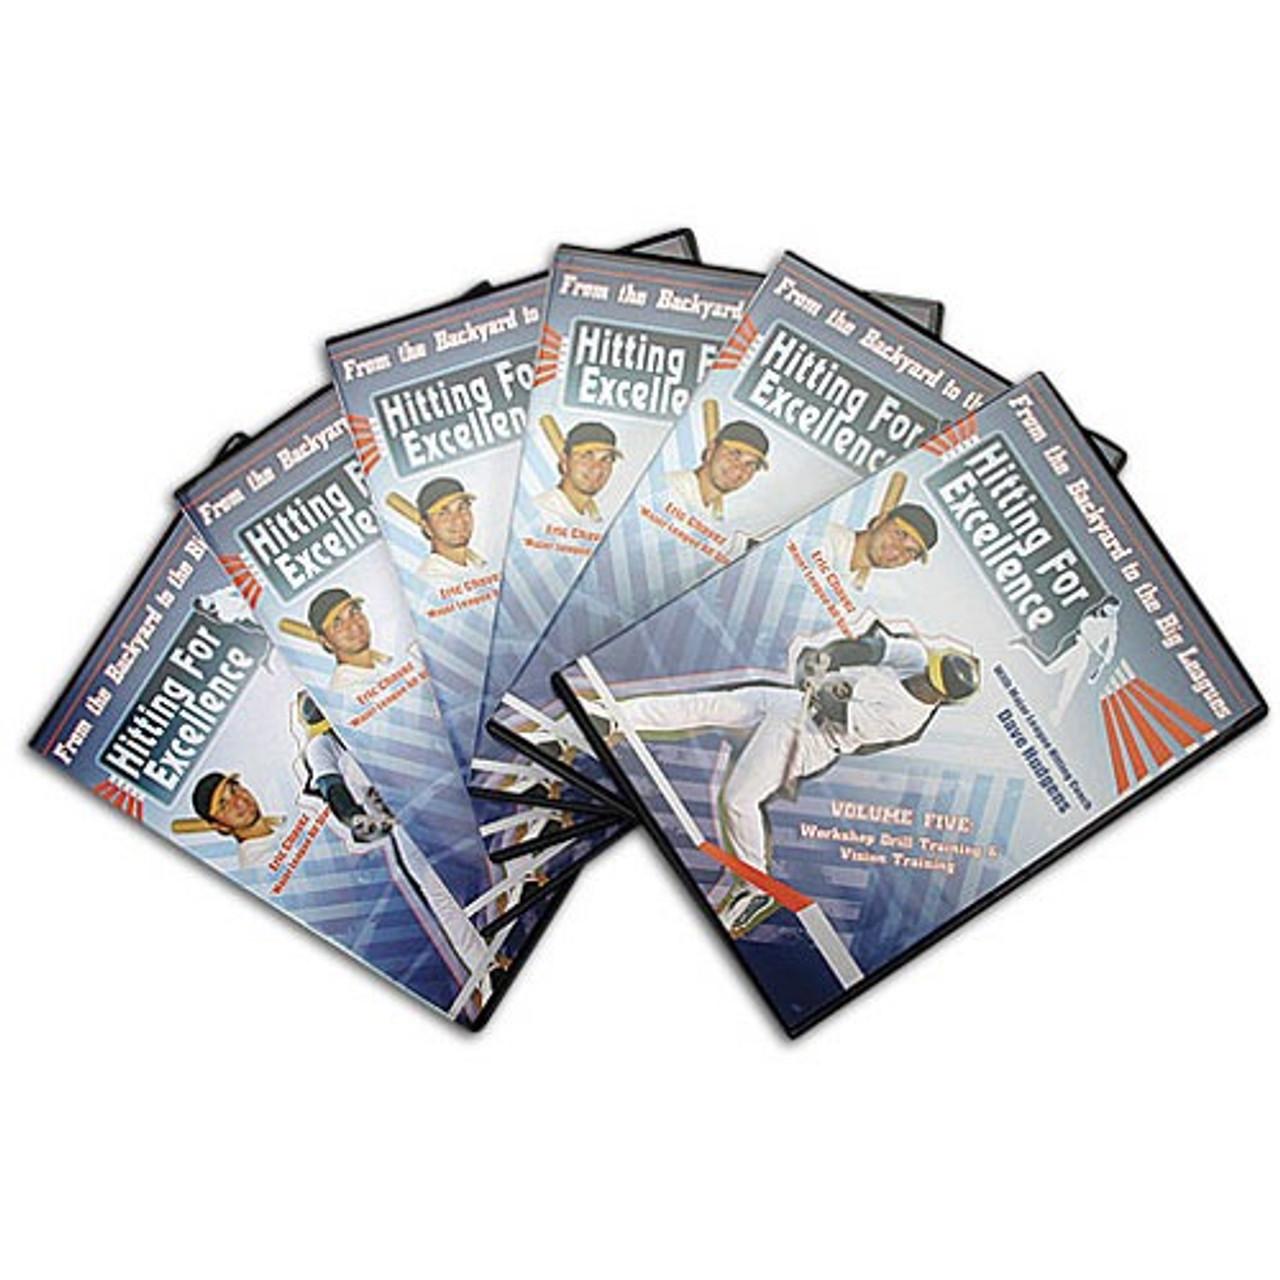 Dave Hudgens Hitting fror Excellence 6 DVD Complete Set